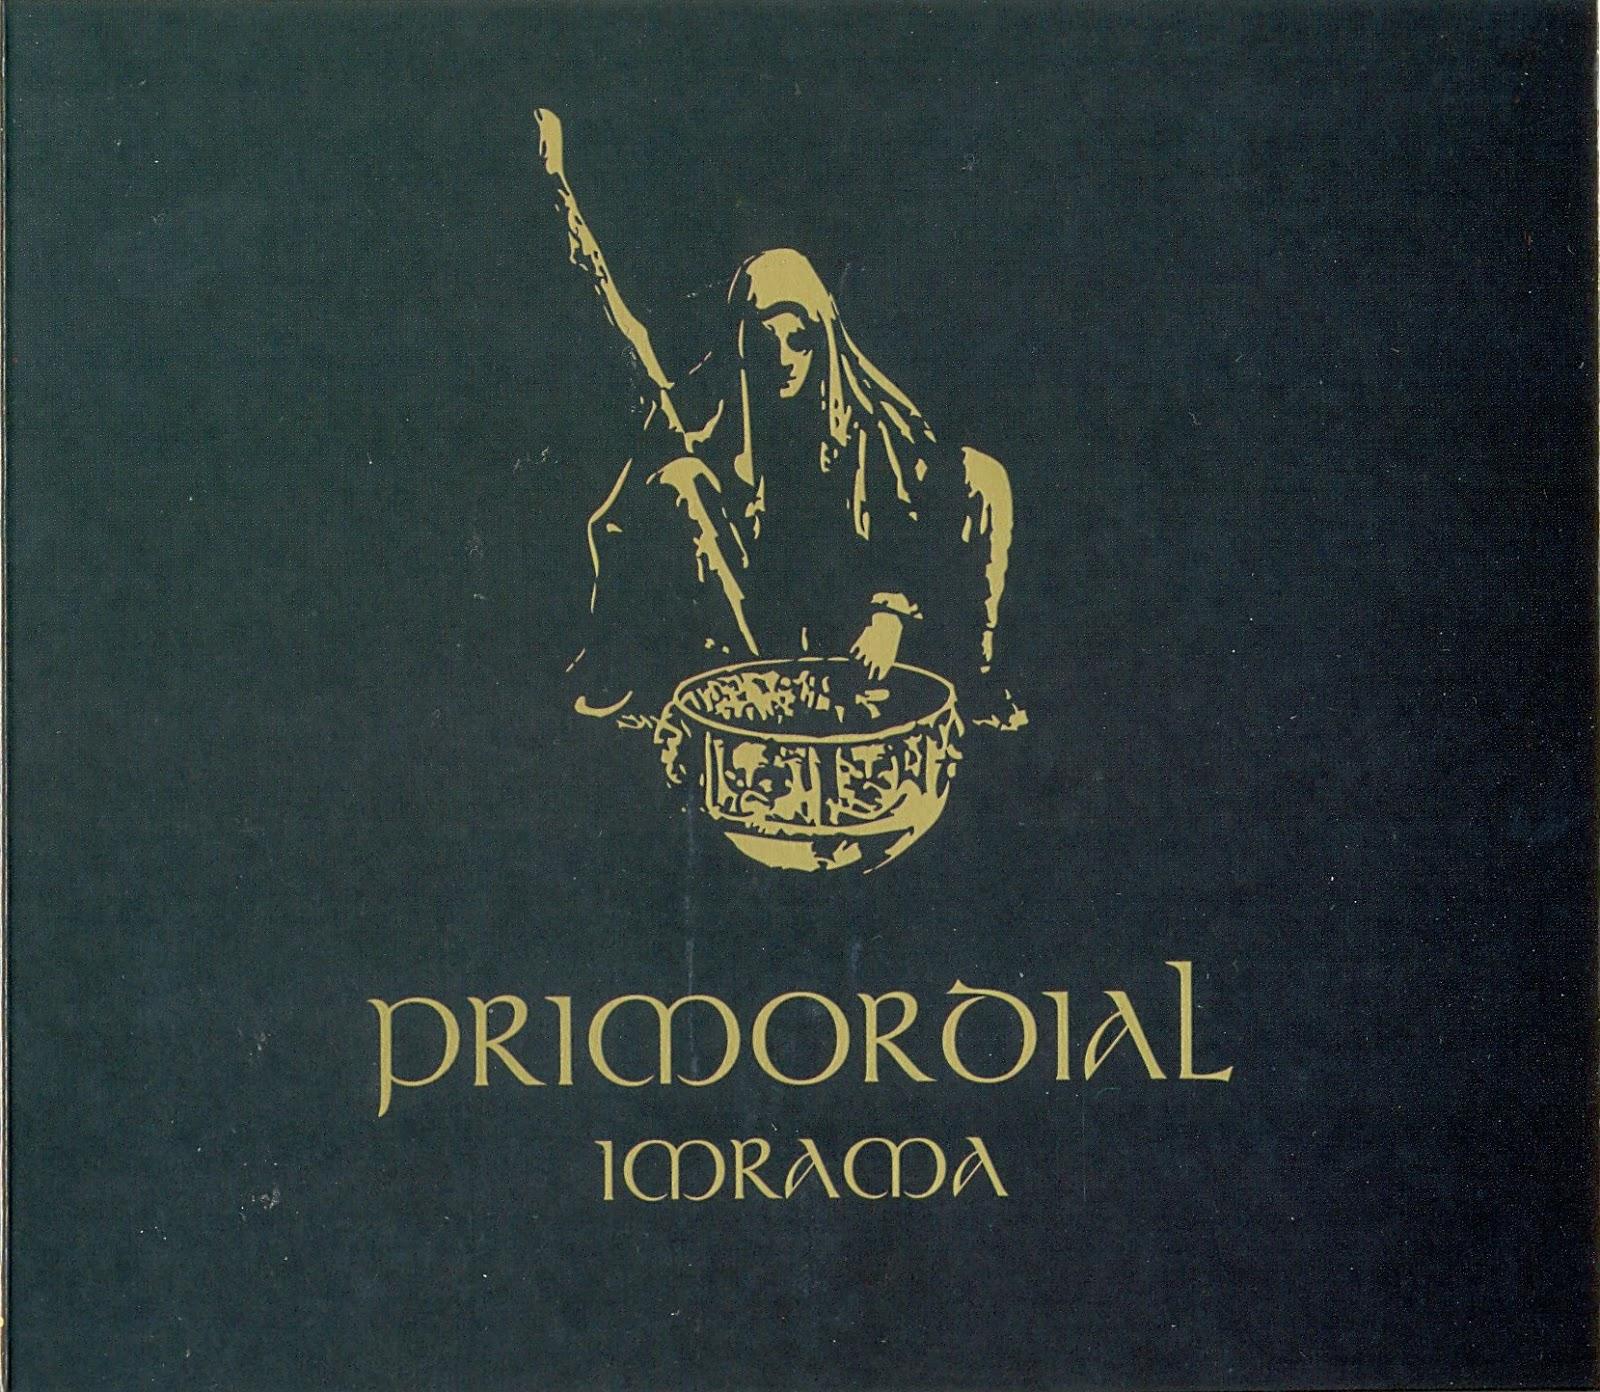 Primordial — Imrama (1995)